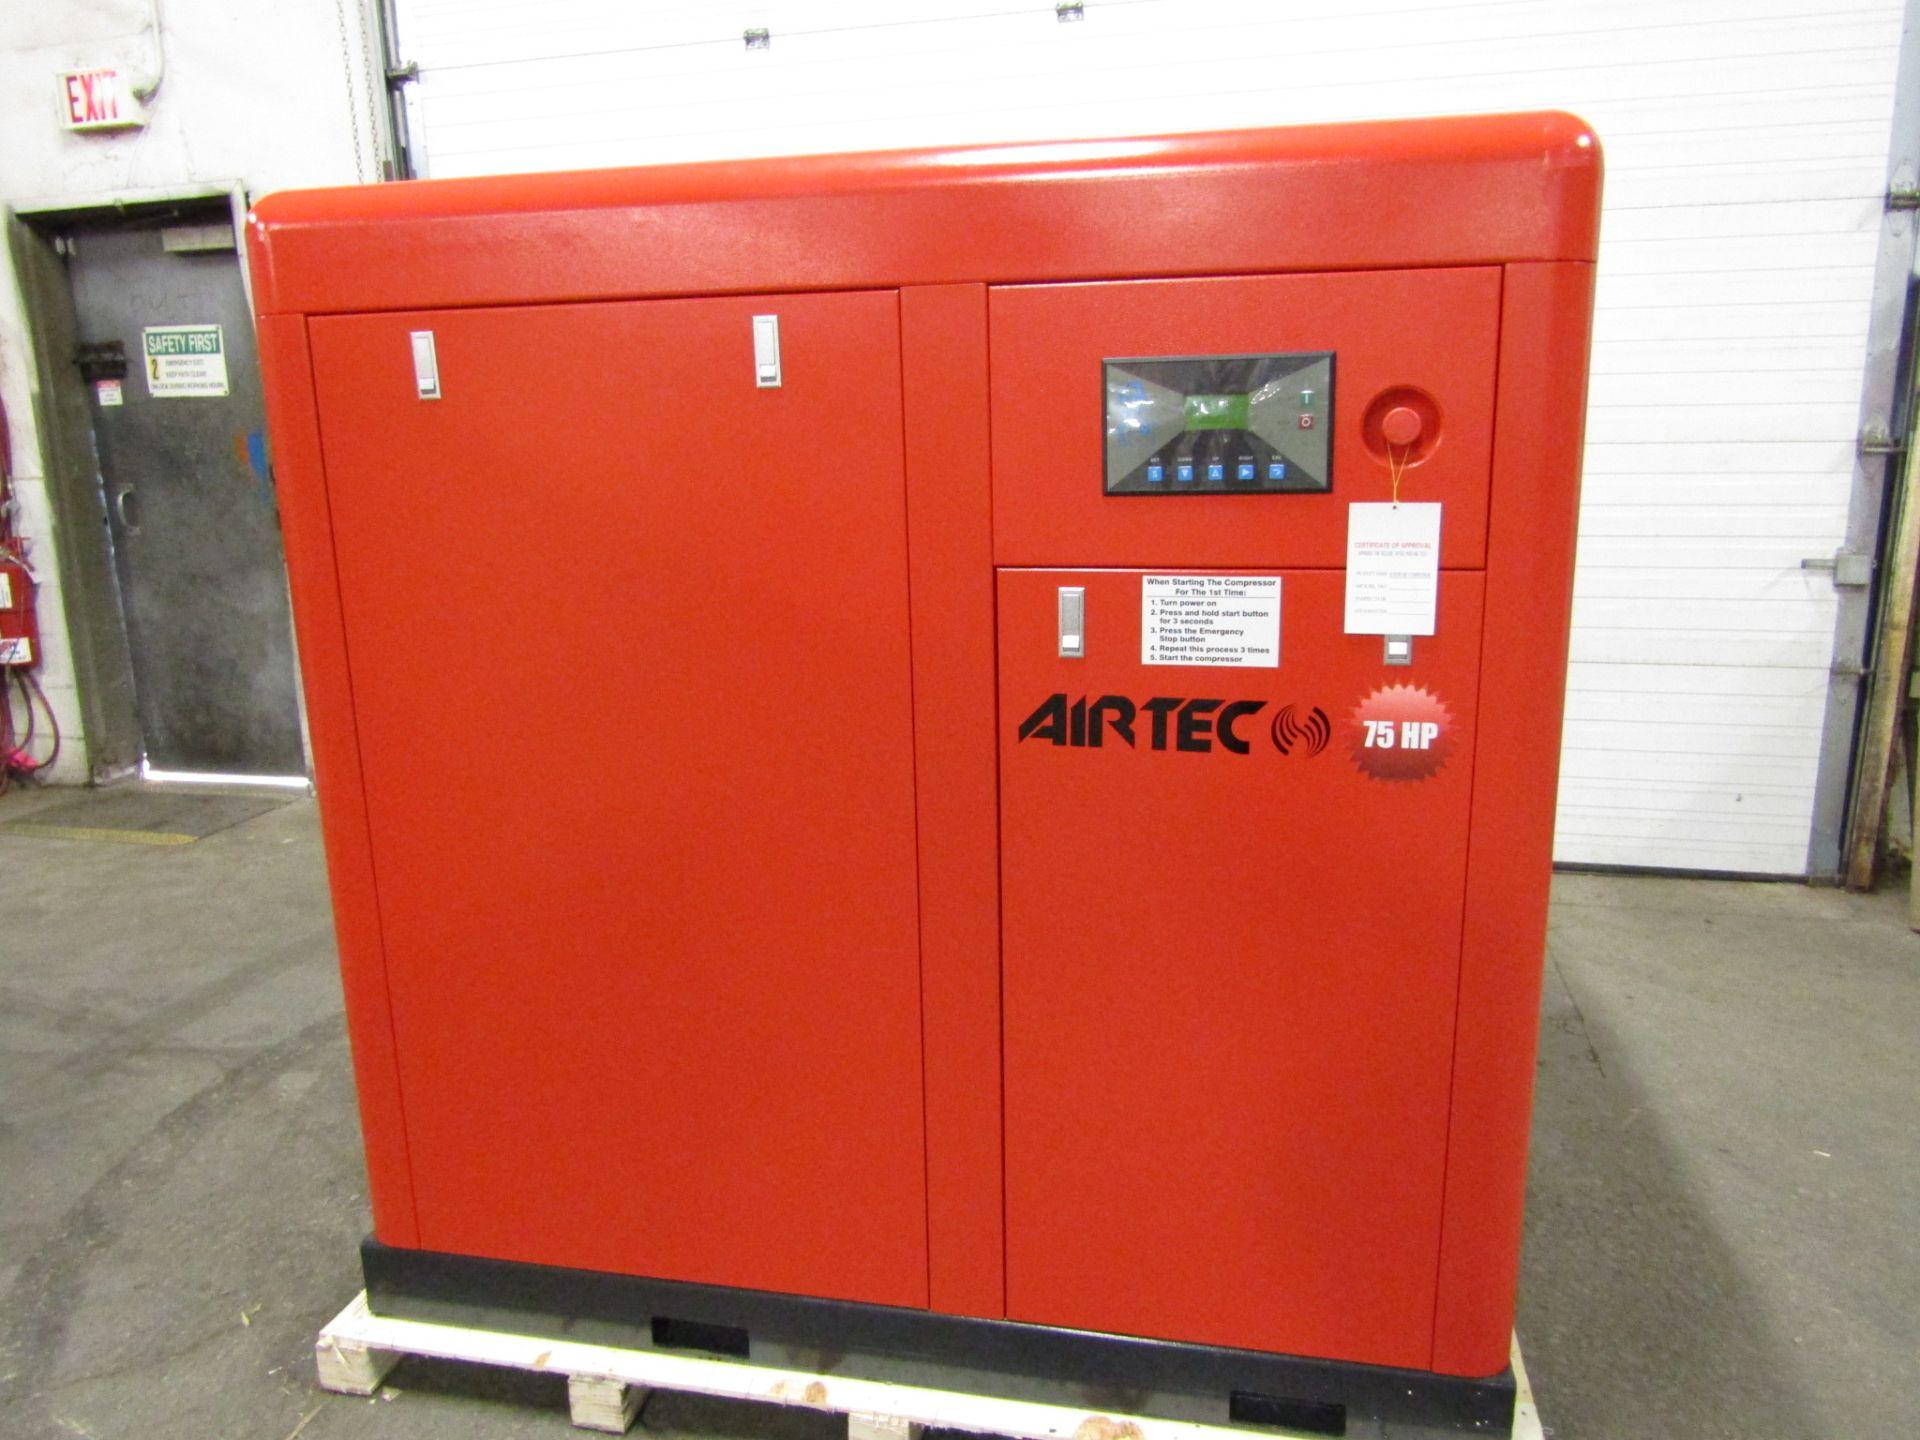 Lot 259 - Airtec 75HP Rotary Screw Air Compressor - MINT UNUSED COMPRESSOR